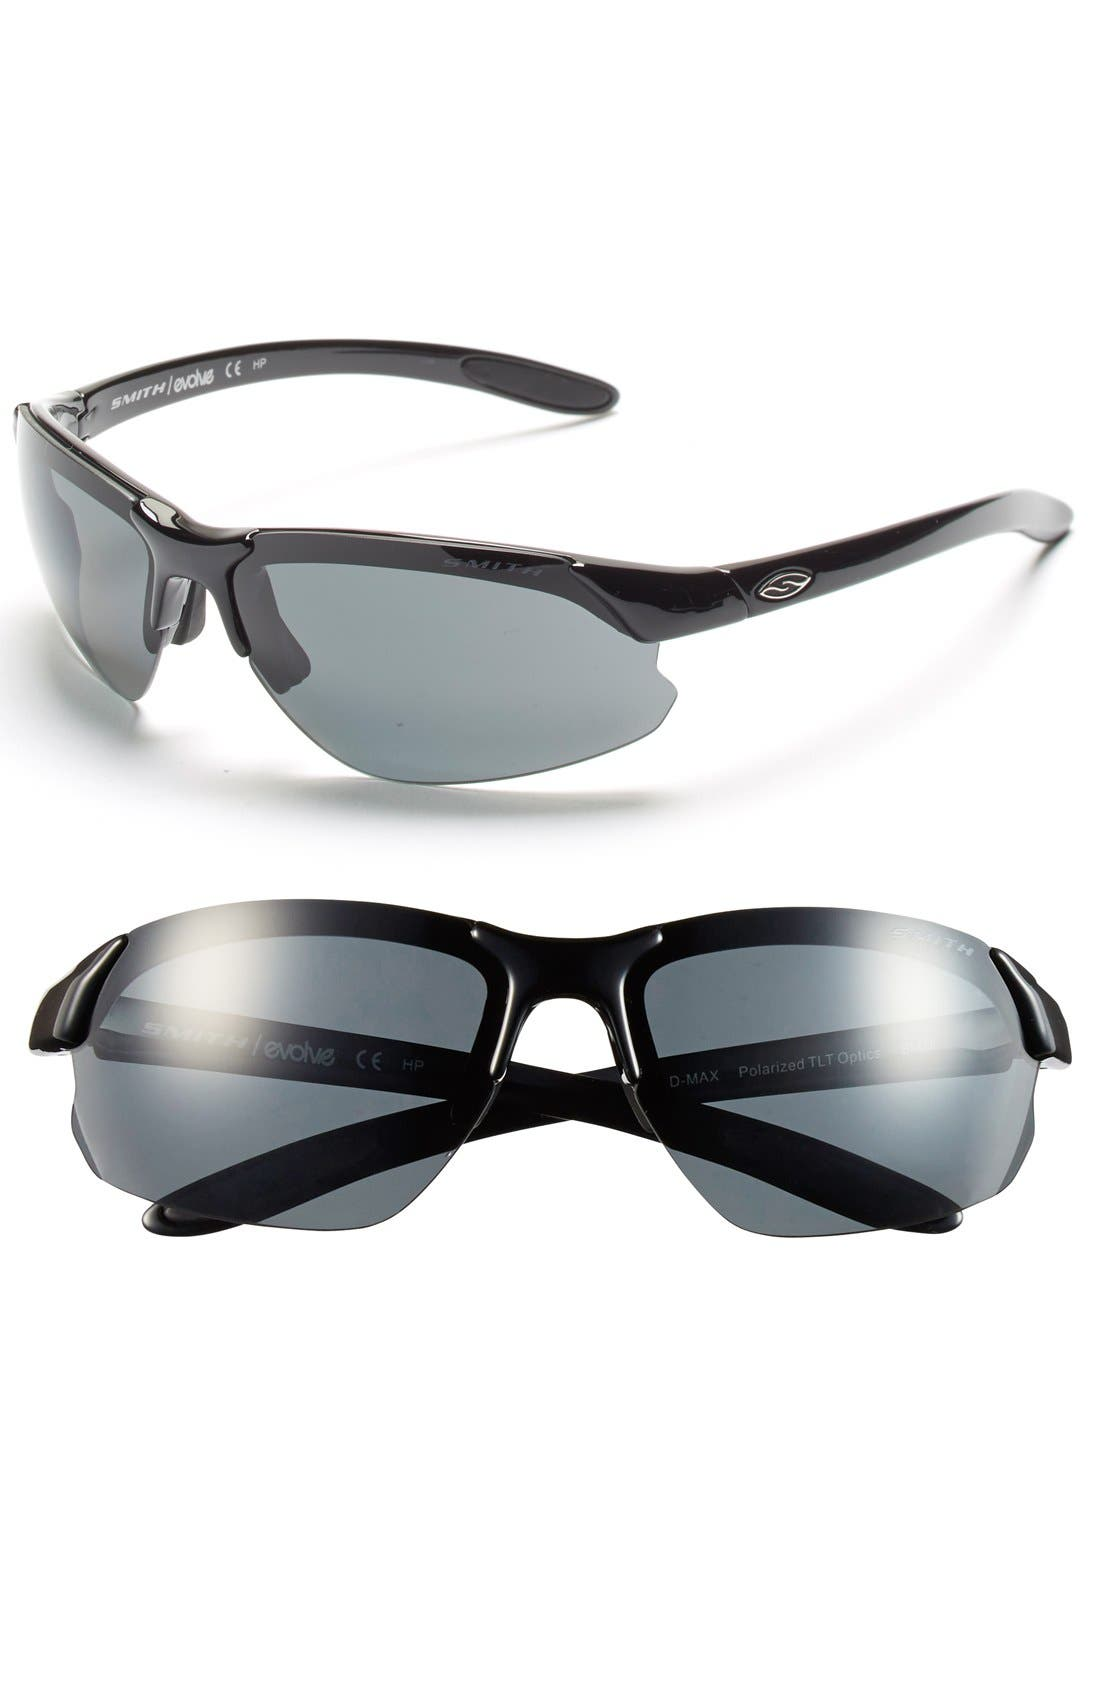 'Parallel DMax' 65mm Polarized Sunglasses,                             Main thumbnail 1, color,                             Black/ Polar Grey/ Clear